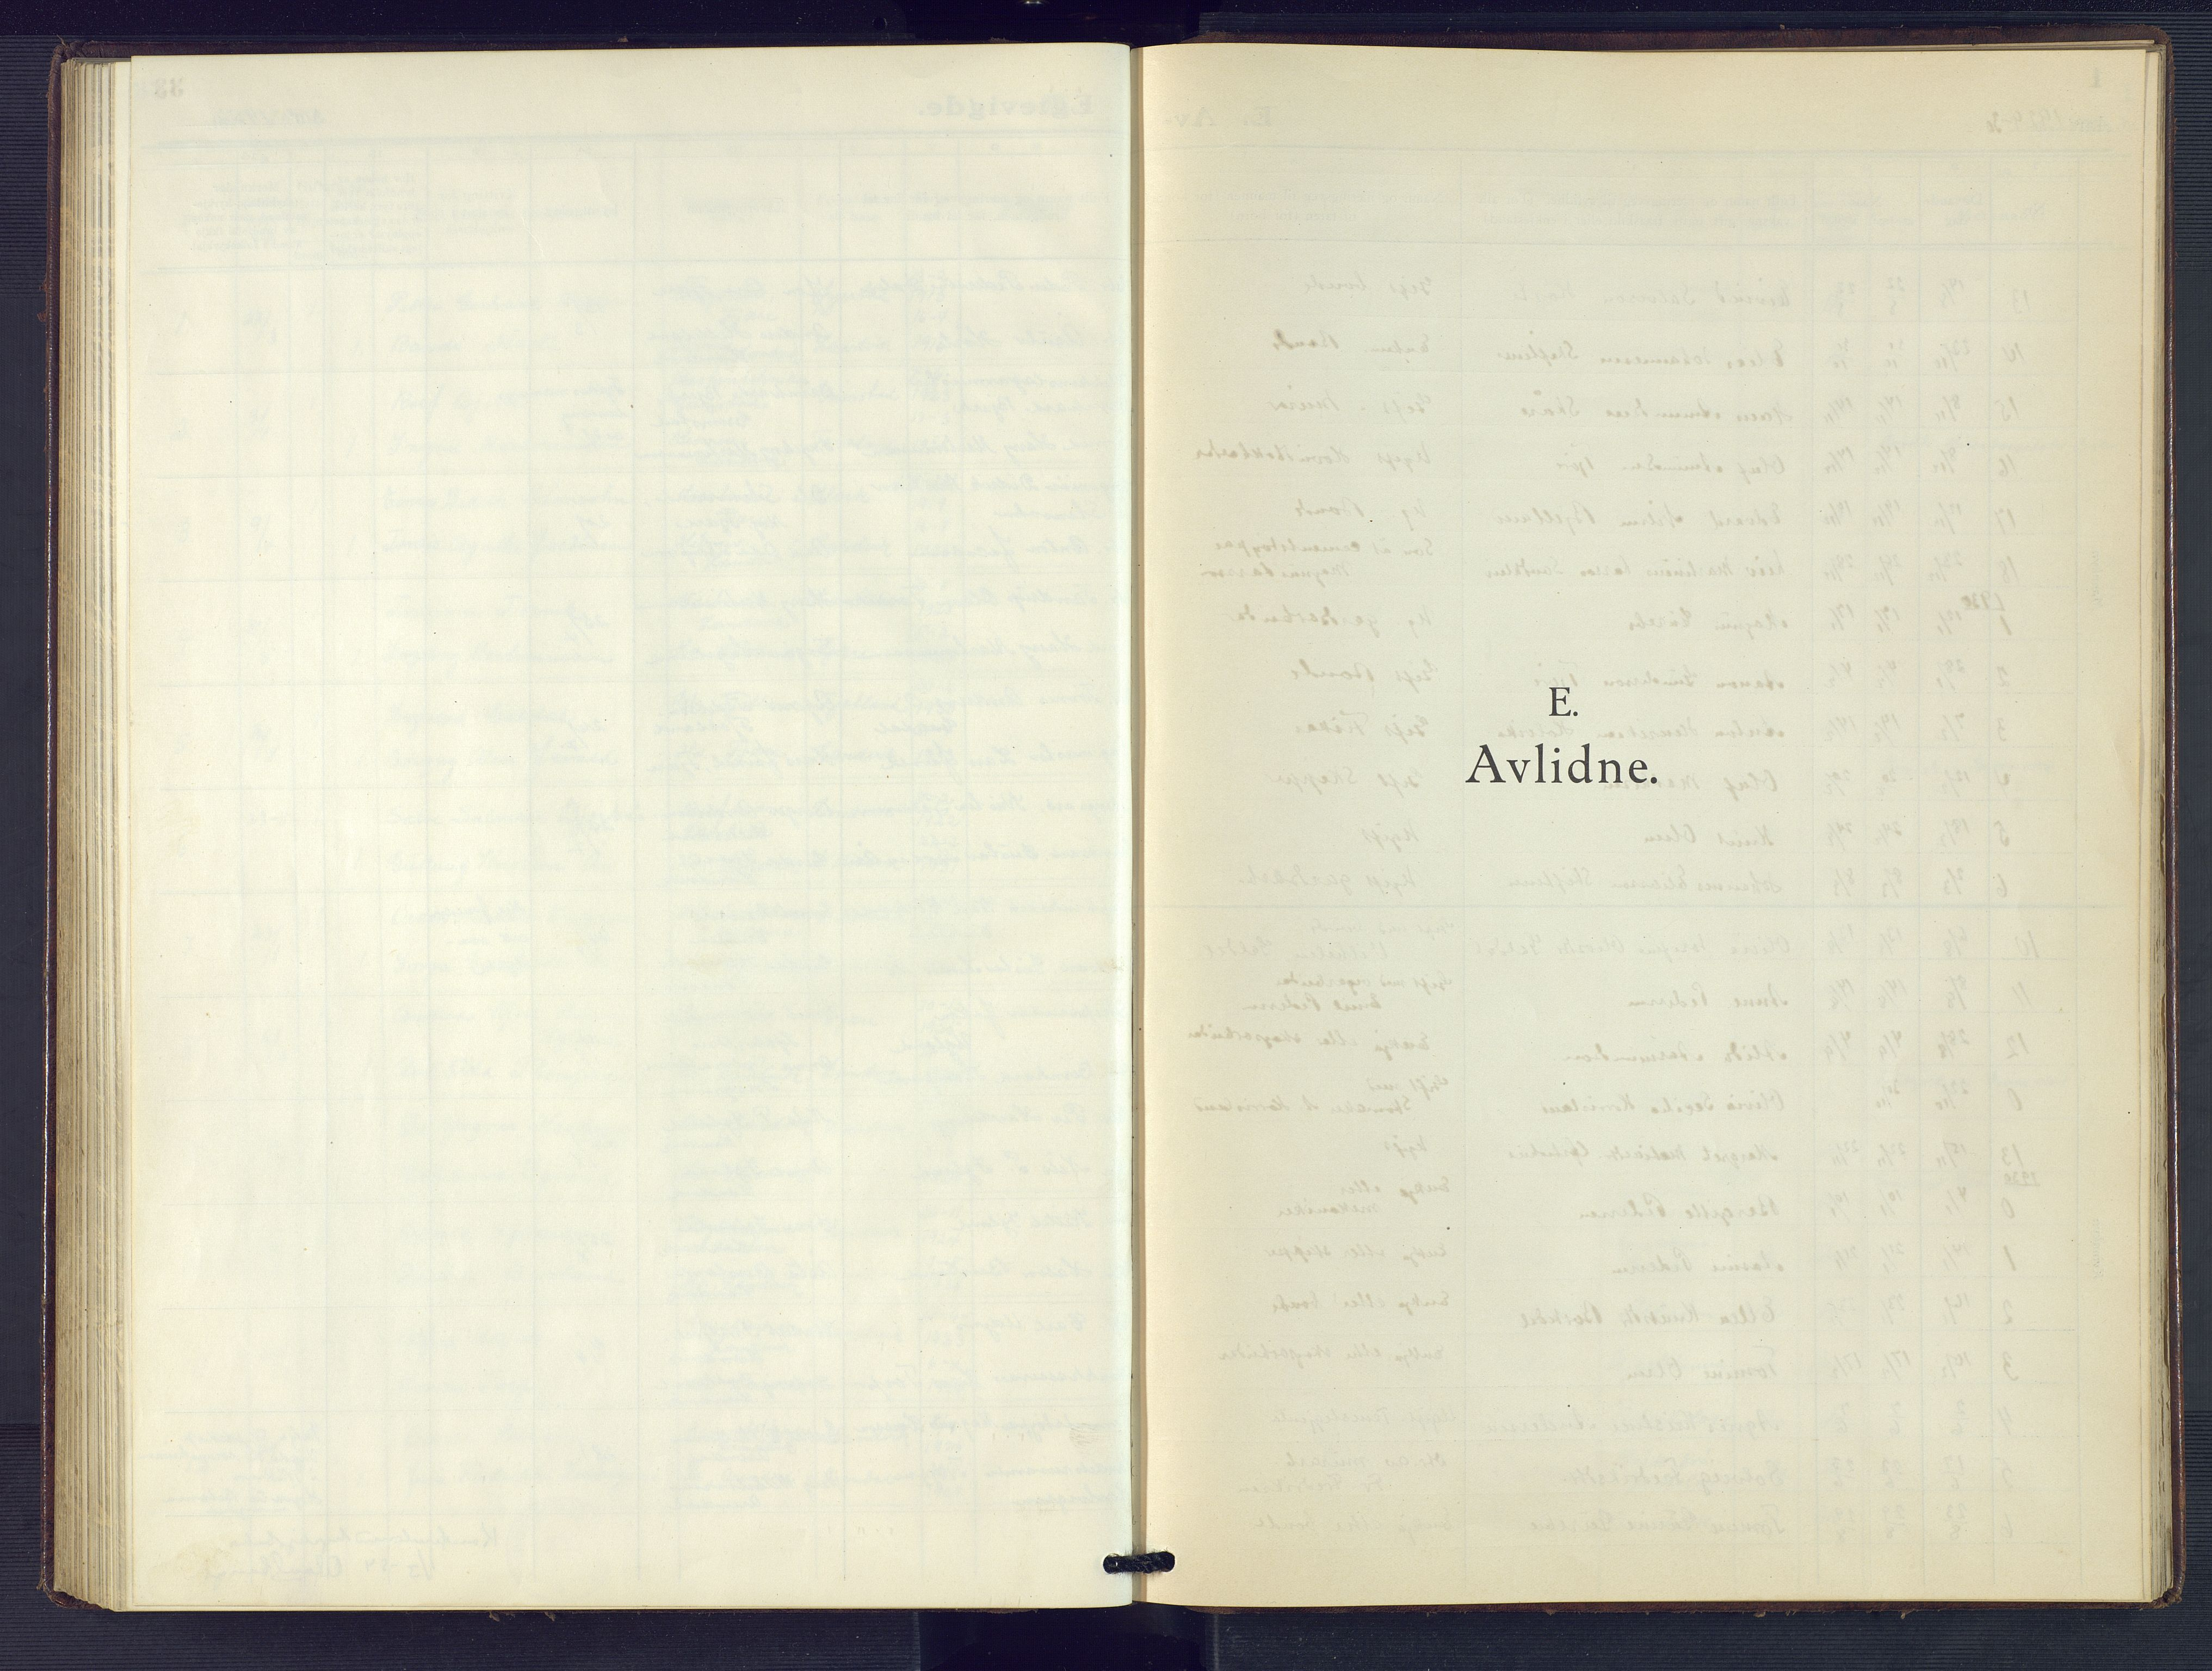 SAK, Hommedal sokneprestkontor, F/Fb/Fbb/L0009: Klokkerbok nr. B 9, 1929-1953